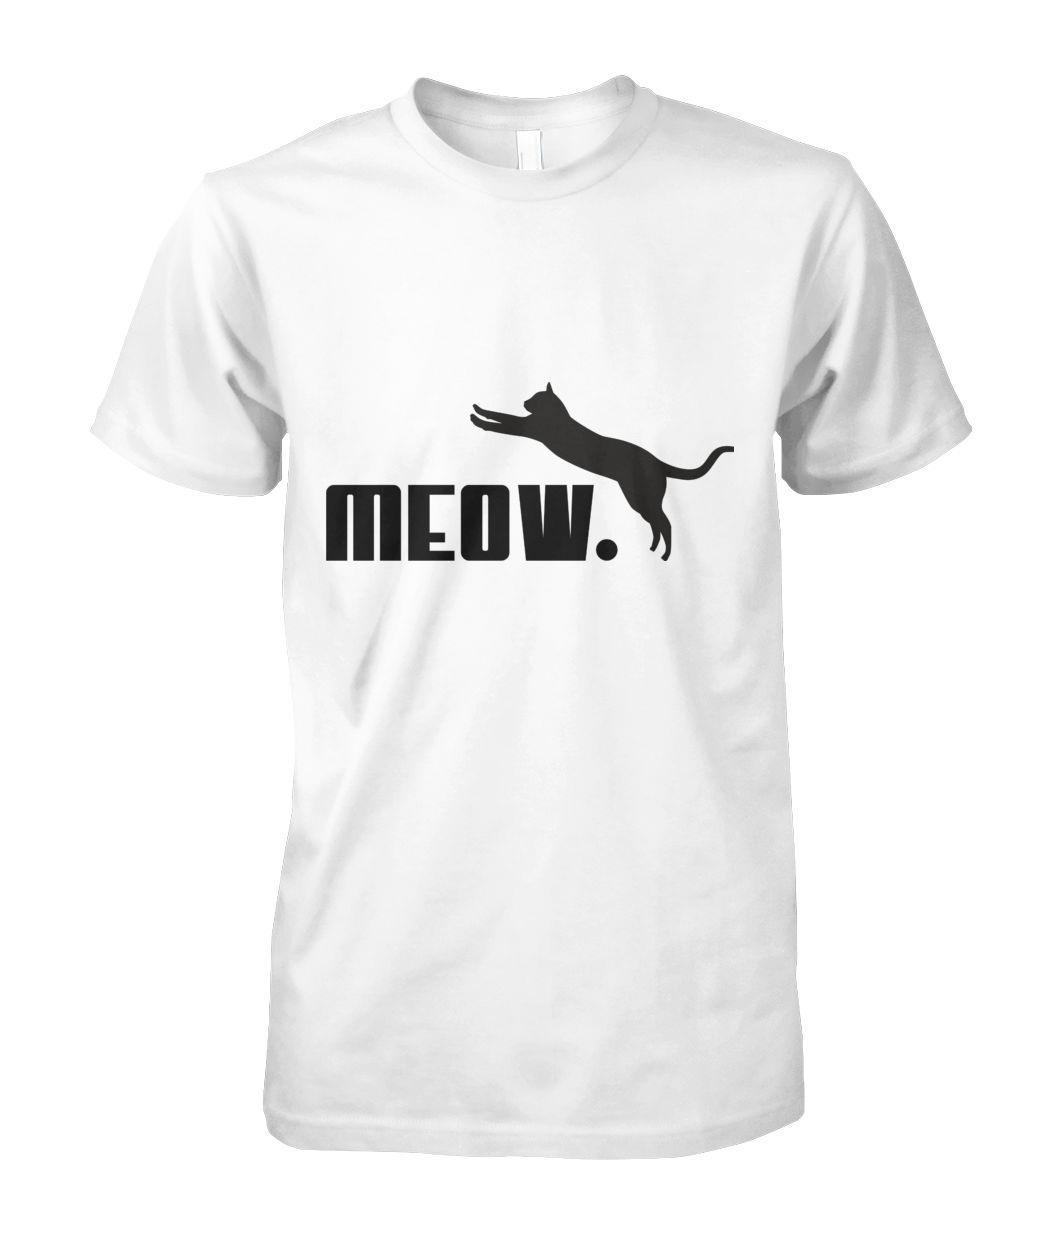 b836dc27 Black Cat, I've Killed for YOU! Tee Sassy Cat T-Shirts #blackcat #cat #t- shirt | The Great Cat Store | Cat store, Cats, Mens tops